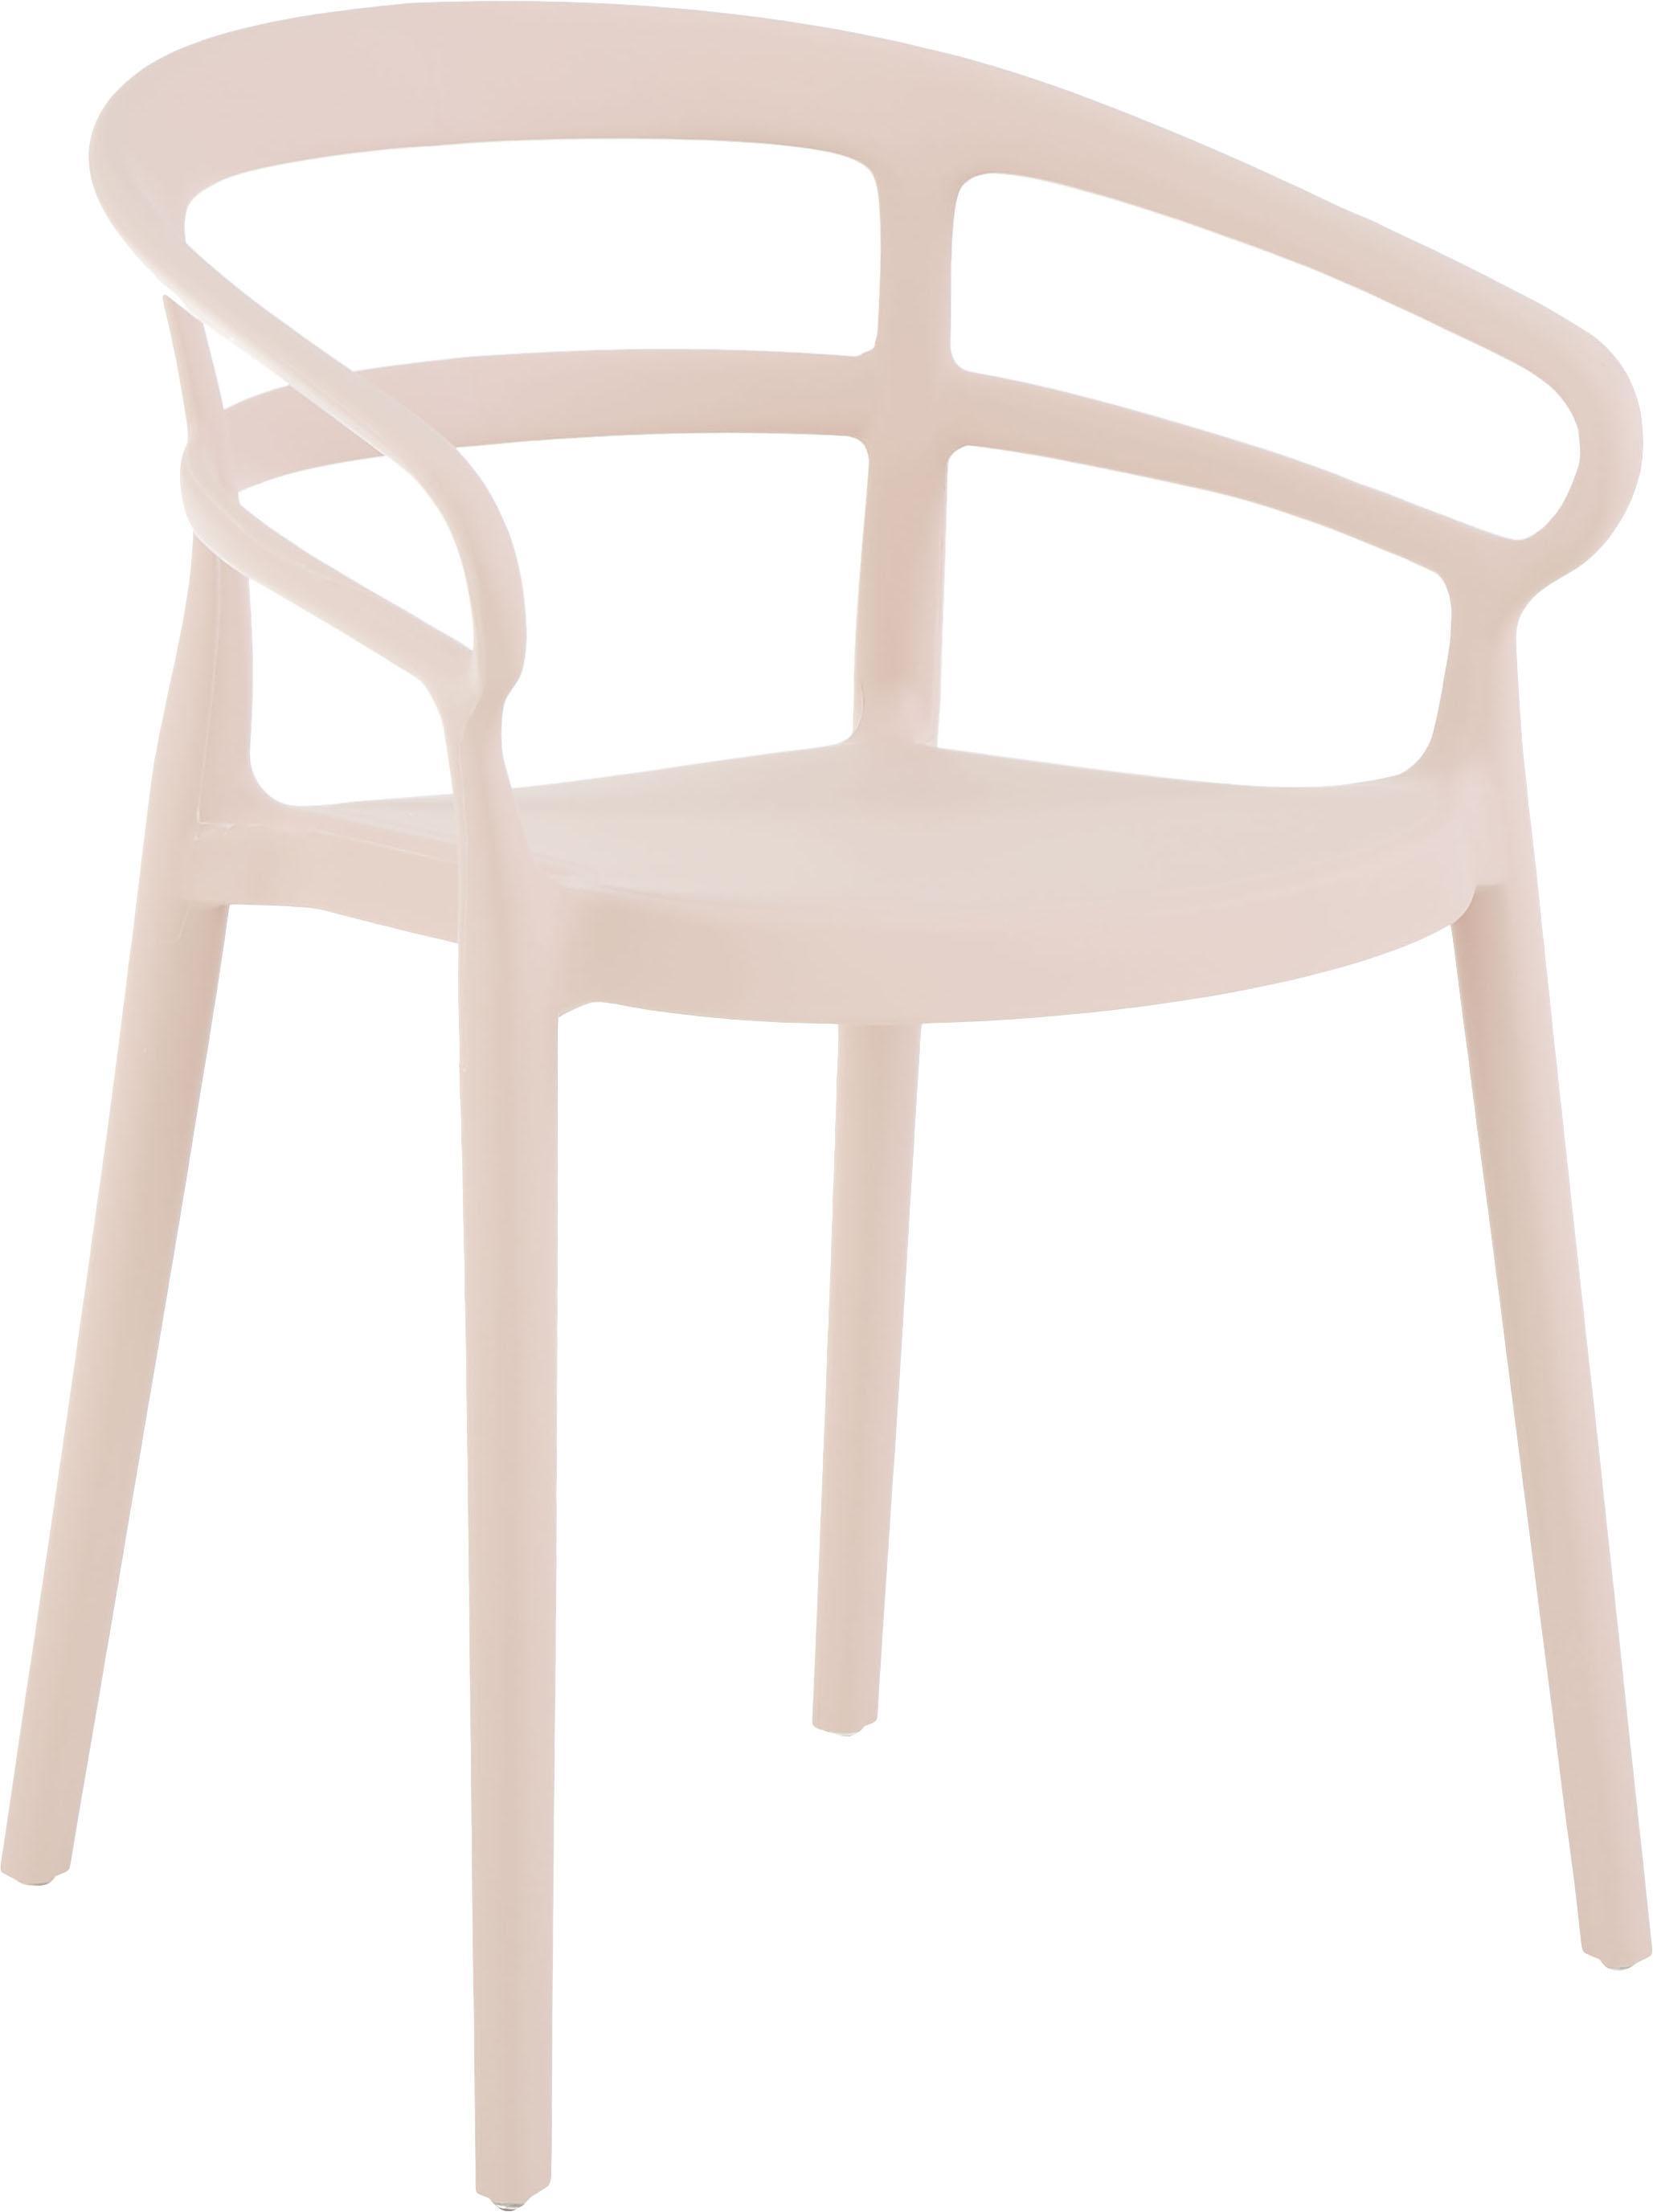 Sedia con braccioli in plastica Rodi 2 pz, Polipropilene, Rosa, Larg. 52 x Prof. 57 cm